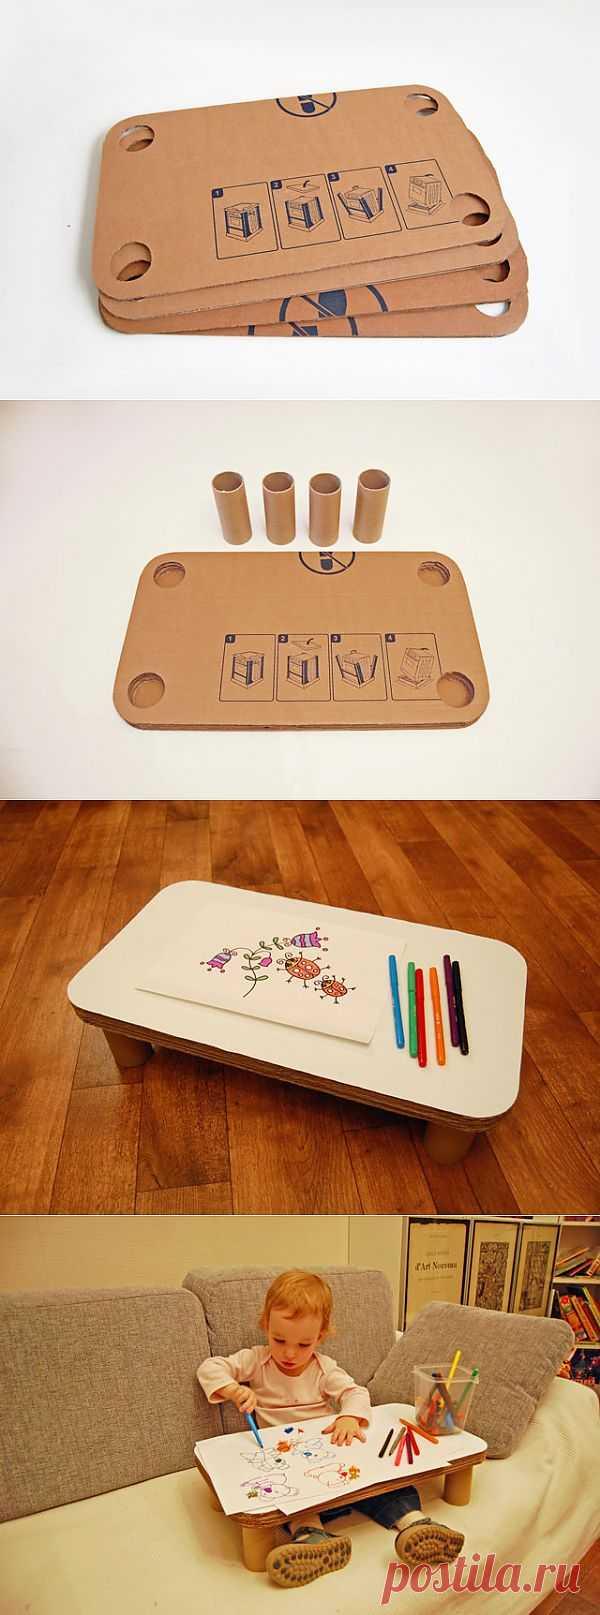 Детский столик на диван из картона. Мастер-класс..